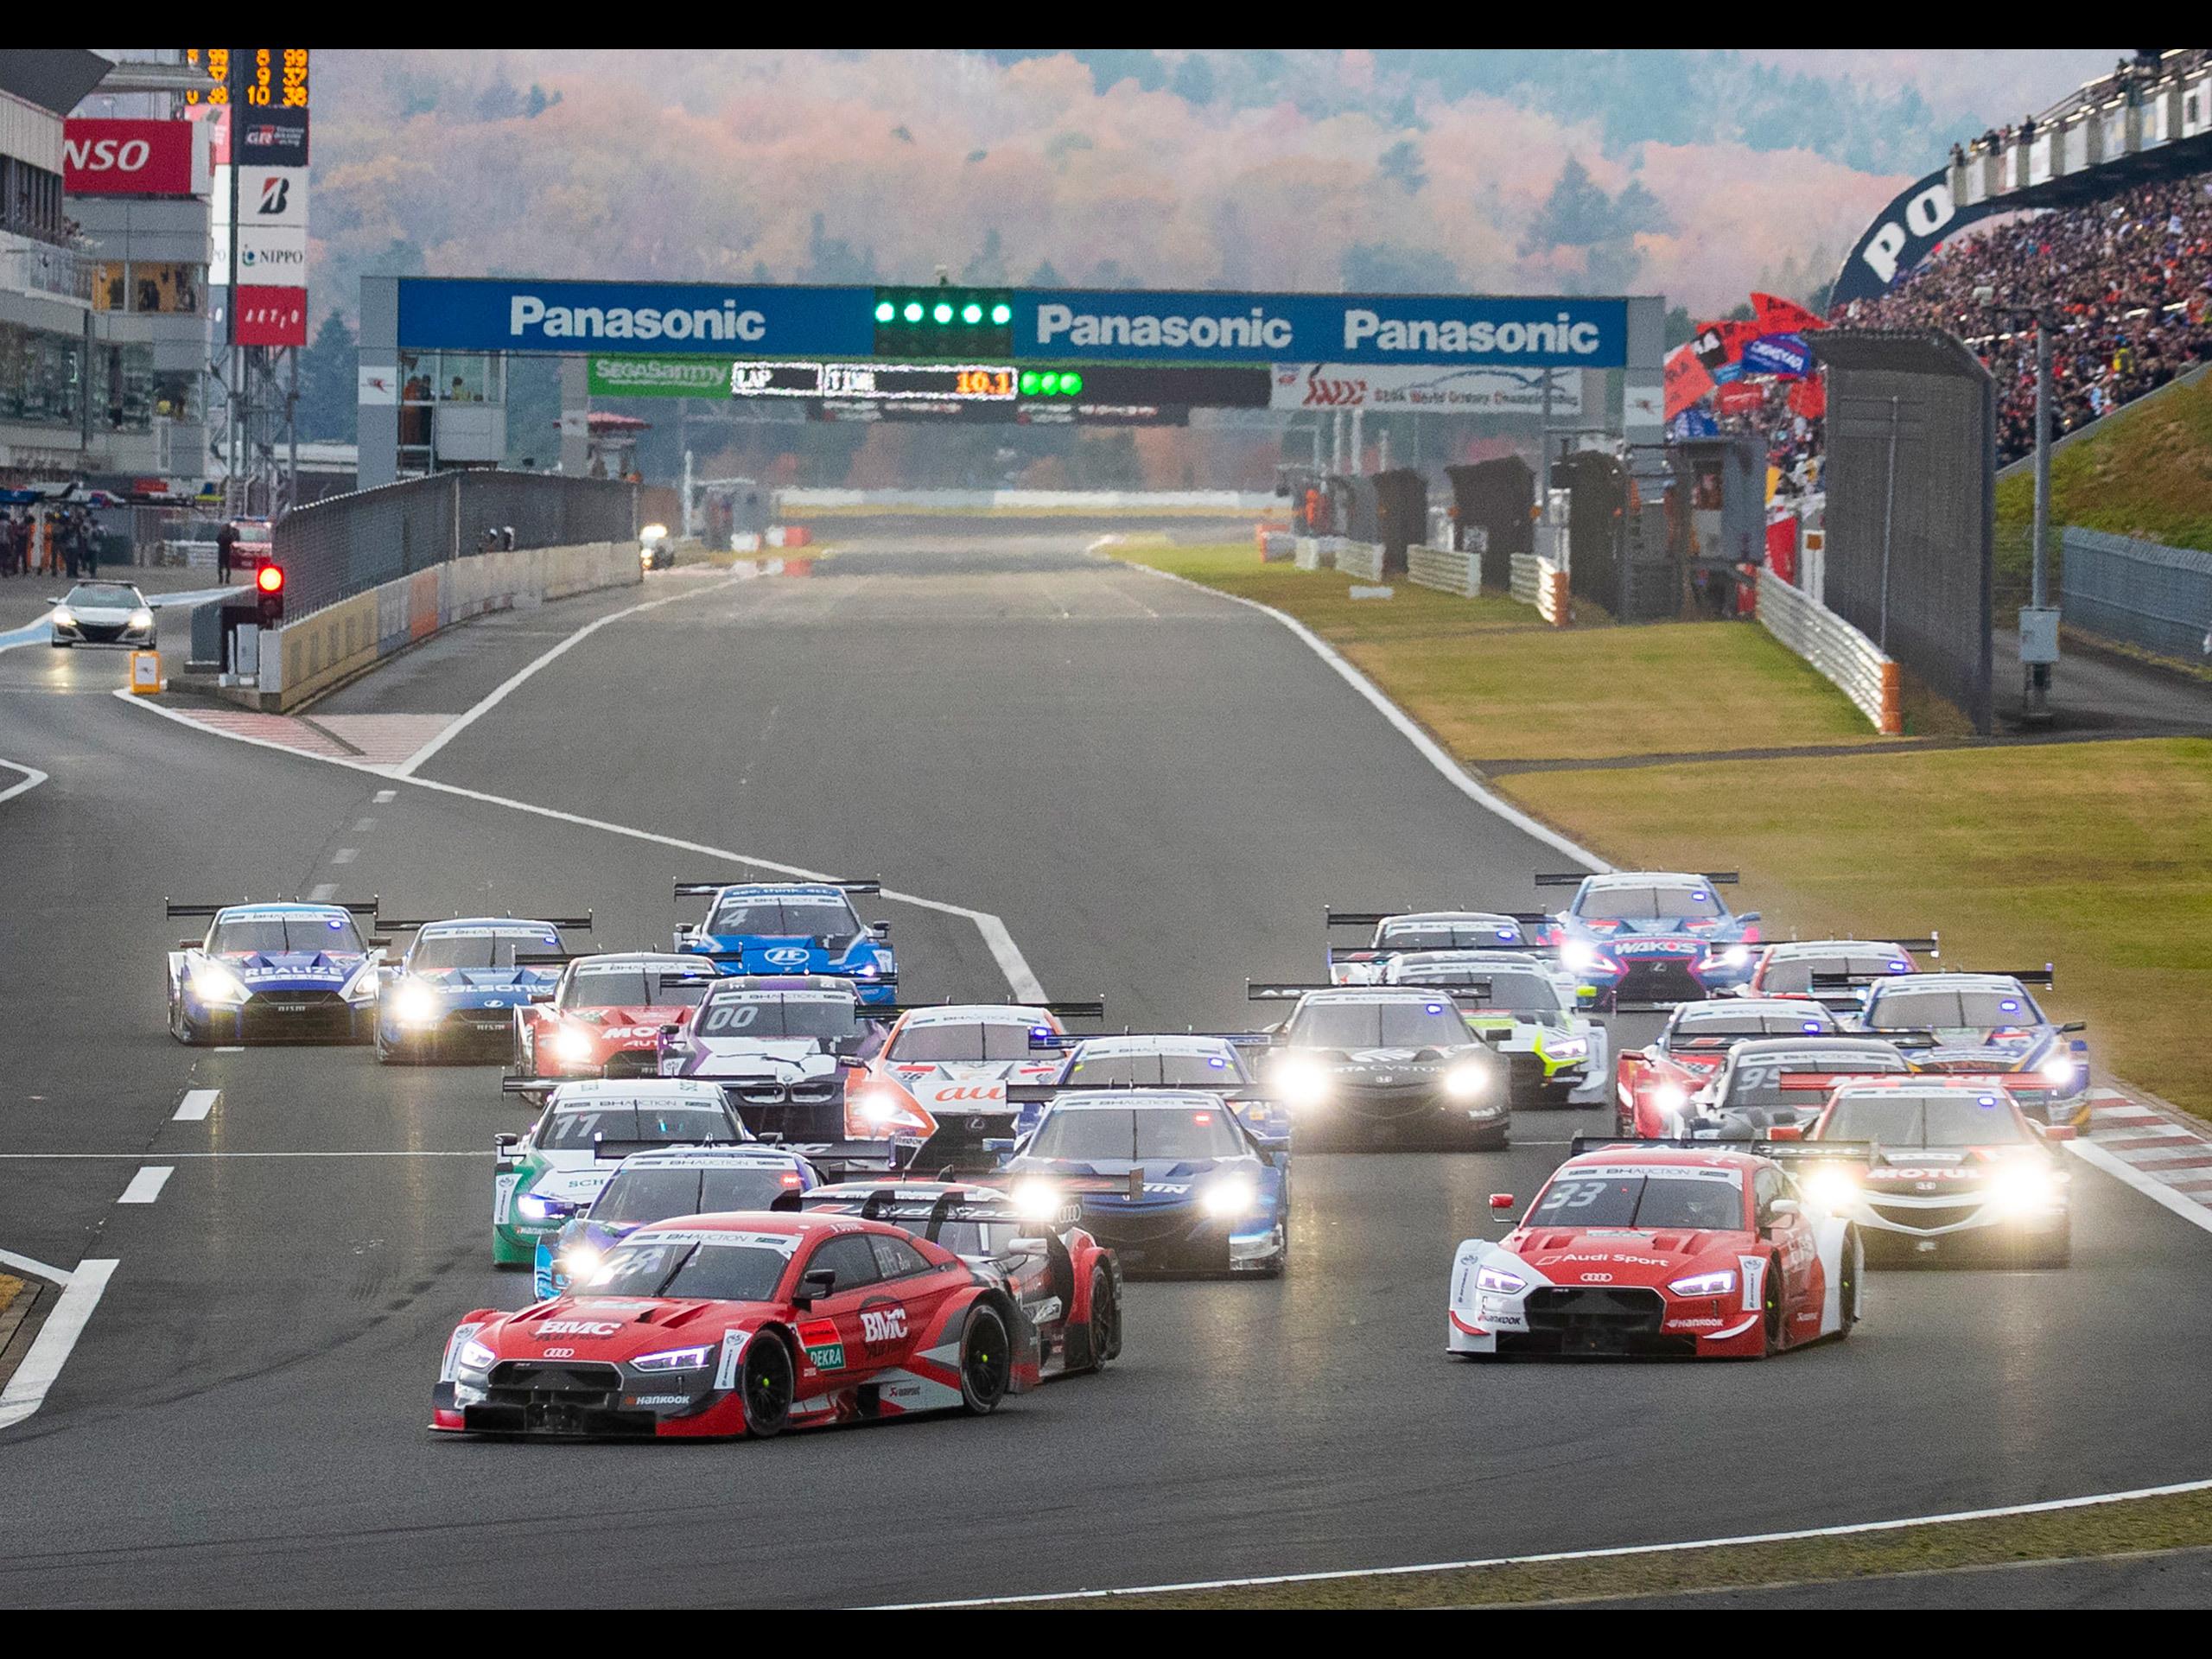 Audi Rs 5 Dtm 3rd At Super Gt X Dtm Dream Race 19 アウディに嵌まる 壁紙画像ブログ